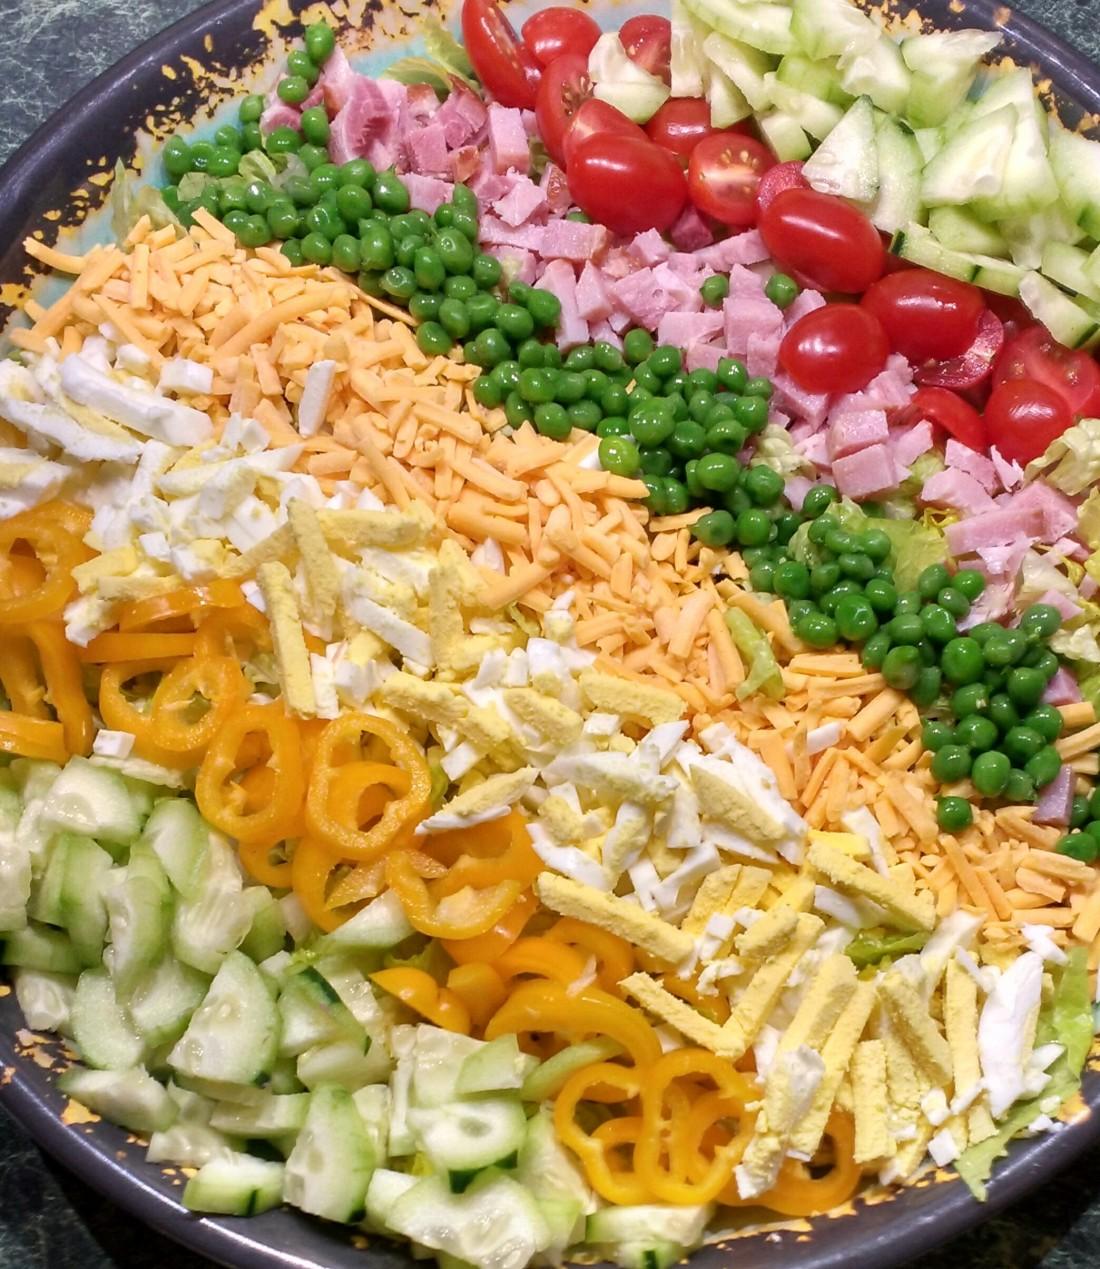 chef salad.jpg